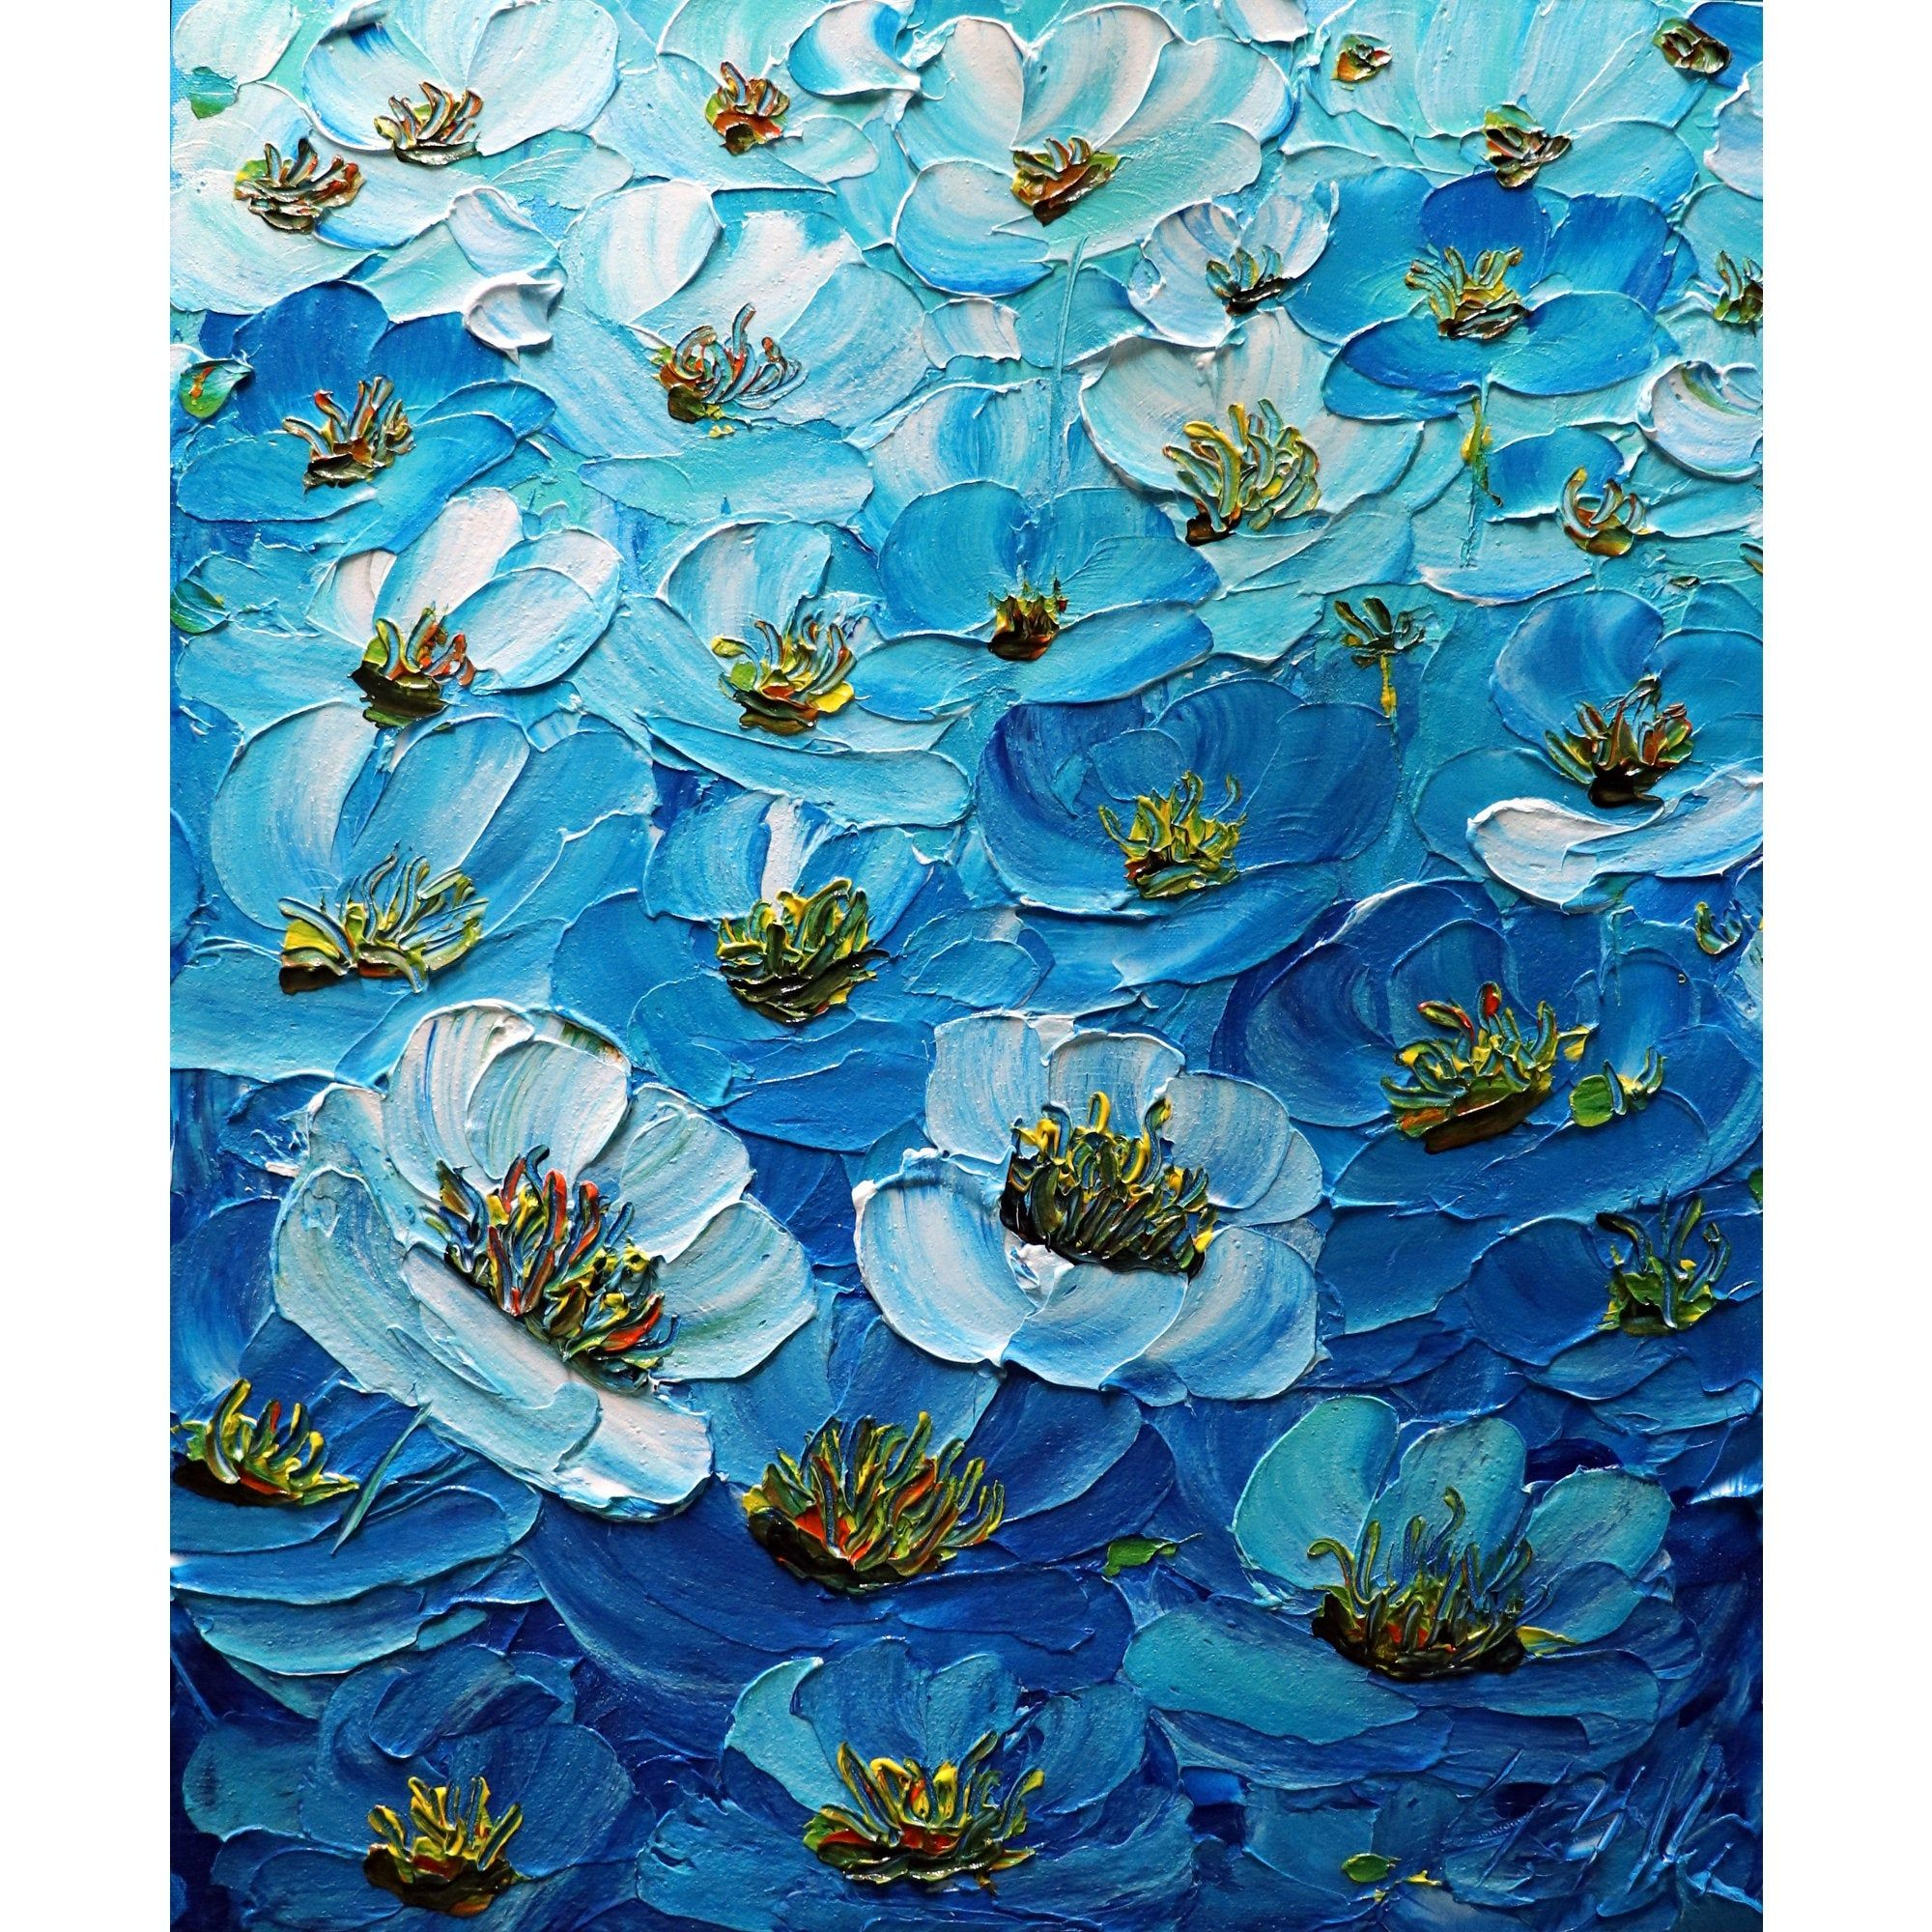 Anemones Enhanced Blue Original Oil Impasto Painting Textured Modern Art By Luiza Vizoli In 2020 Texture Painting Painting Impasto Painting